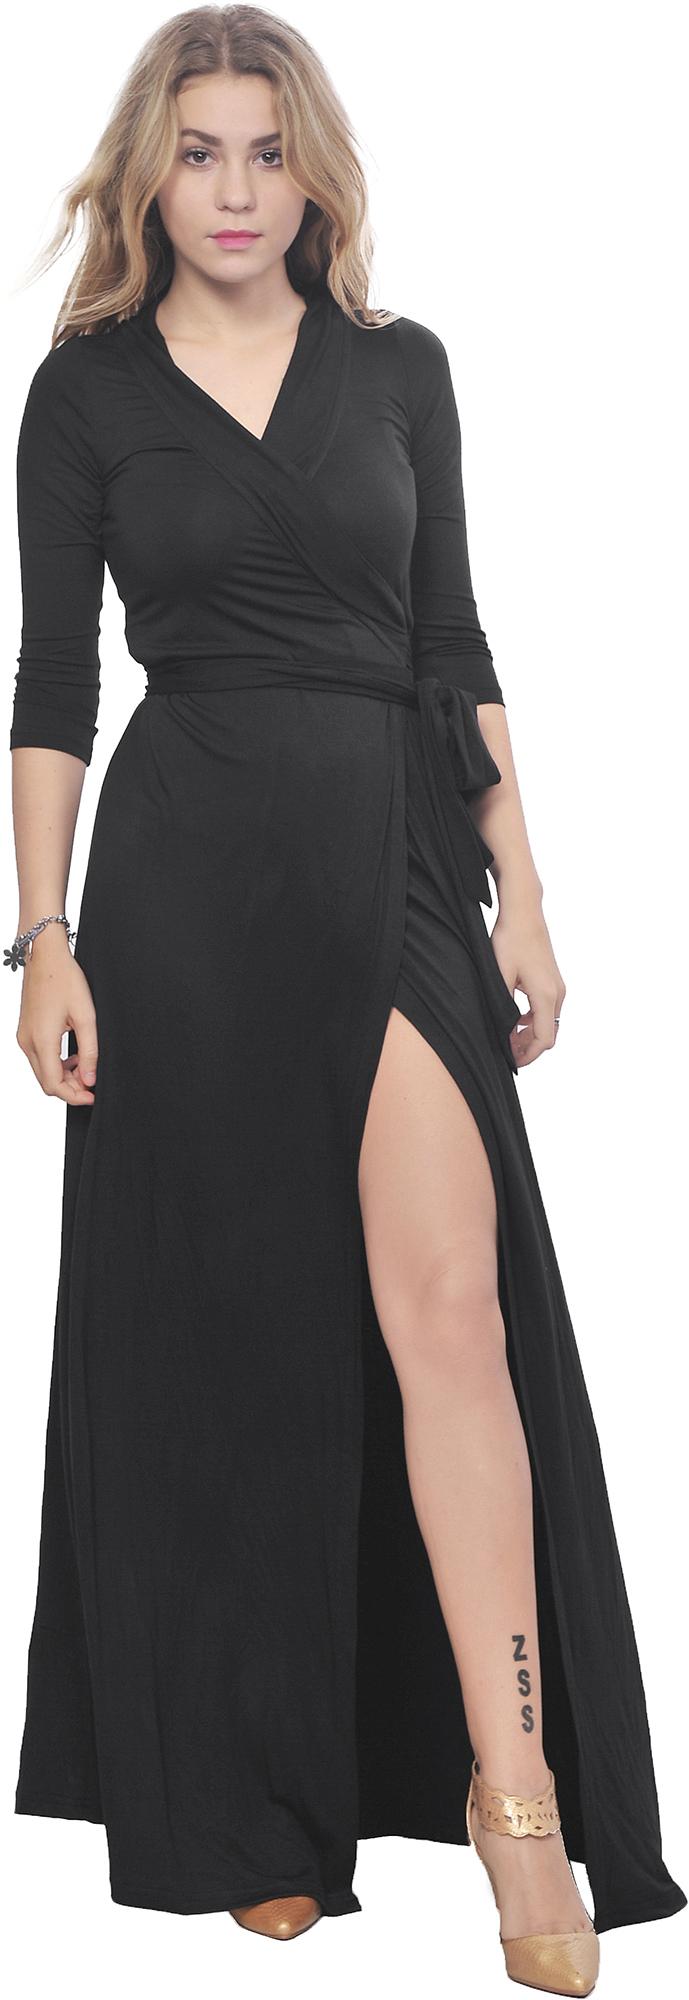 Cool Womens 2 In 1 Strapless Beach Summer Dress / Long Maxi Skirt Ladies Size UK 8-16 | EBay